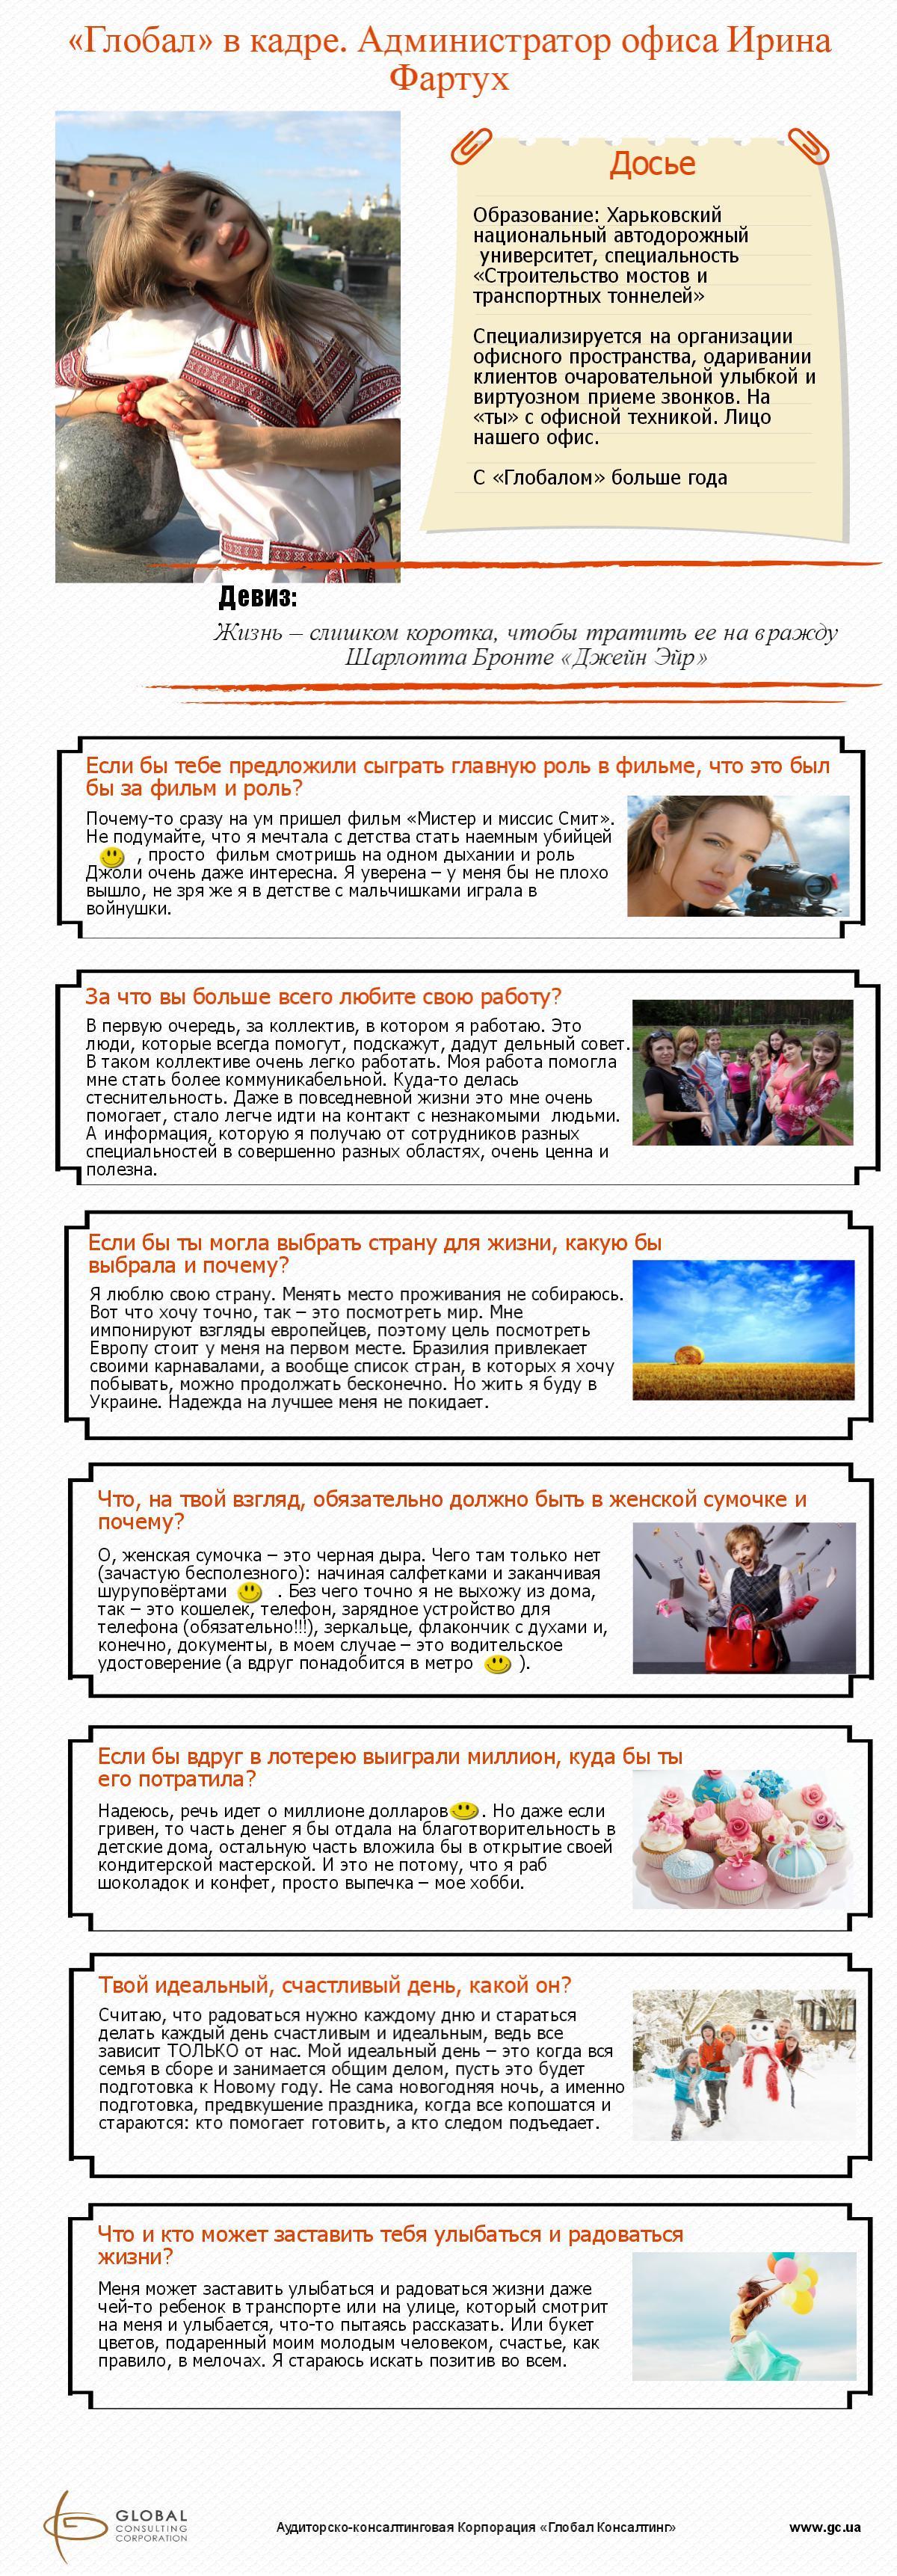 Ирина Фартух Глобал Консалтинг